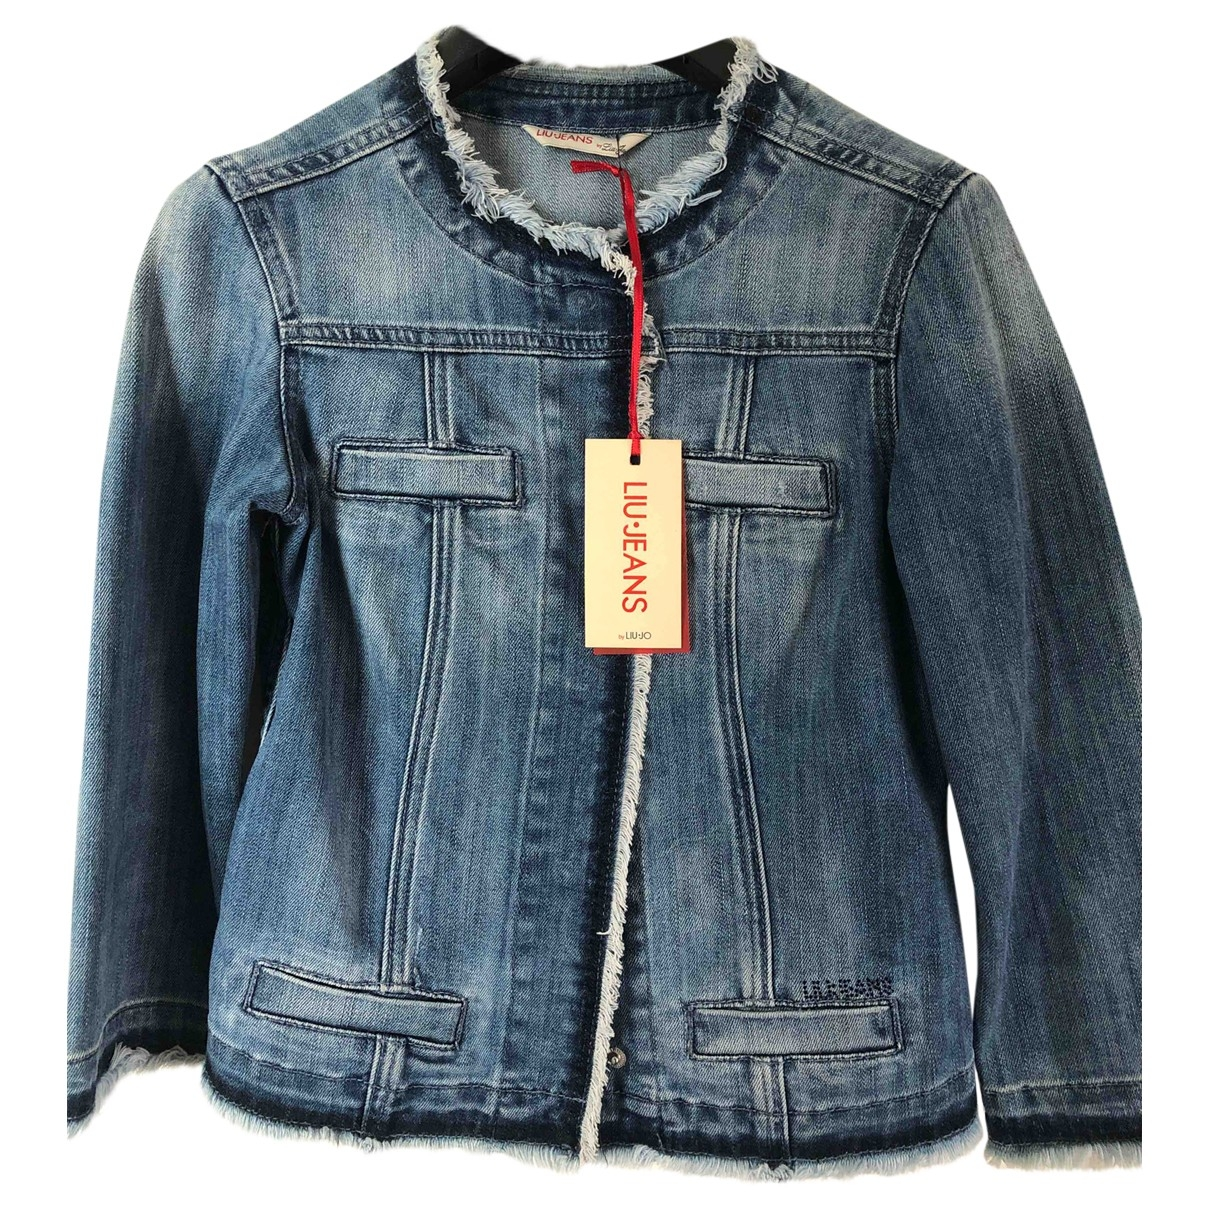 Liu.jo \N Jacke in  Blau Denim - Jeans